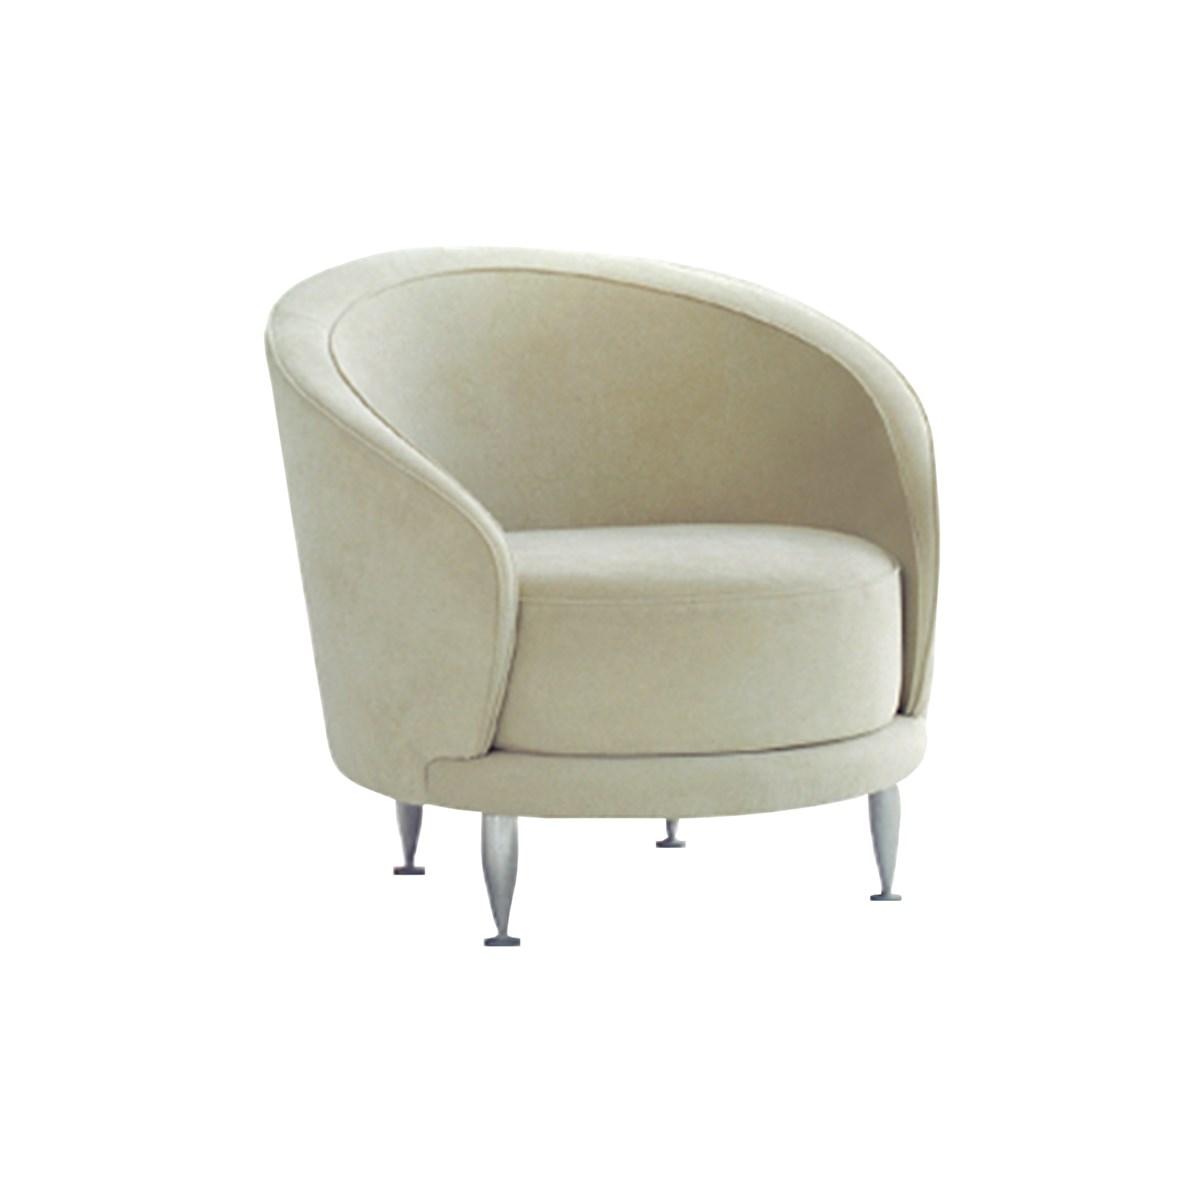 Moroso-Massimo-Losa-Ghini-New-Tone-Armchair-Matisse-1